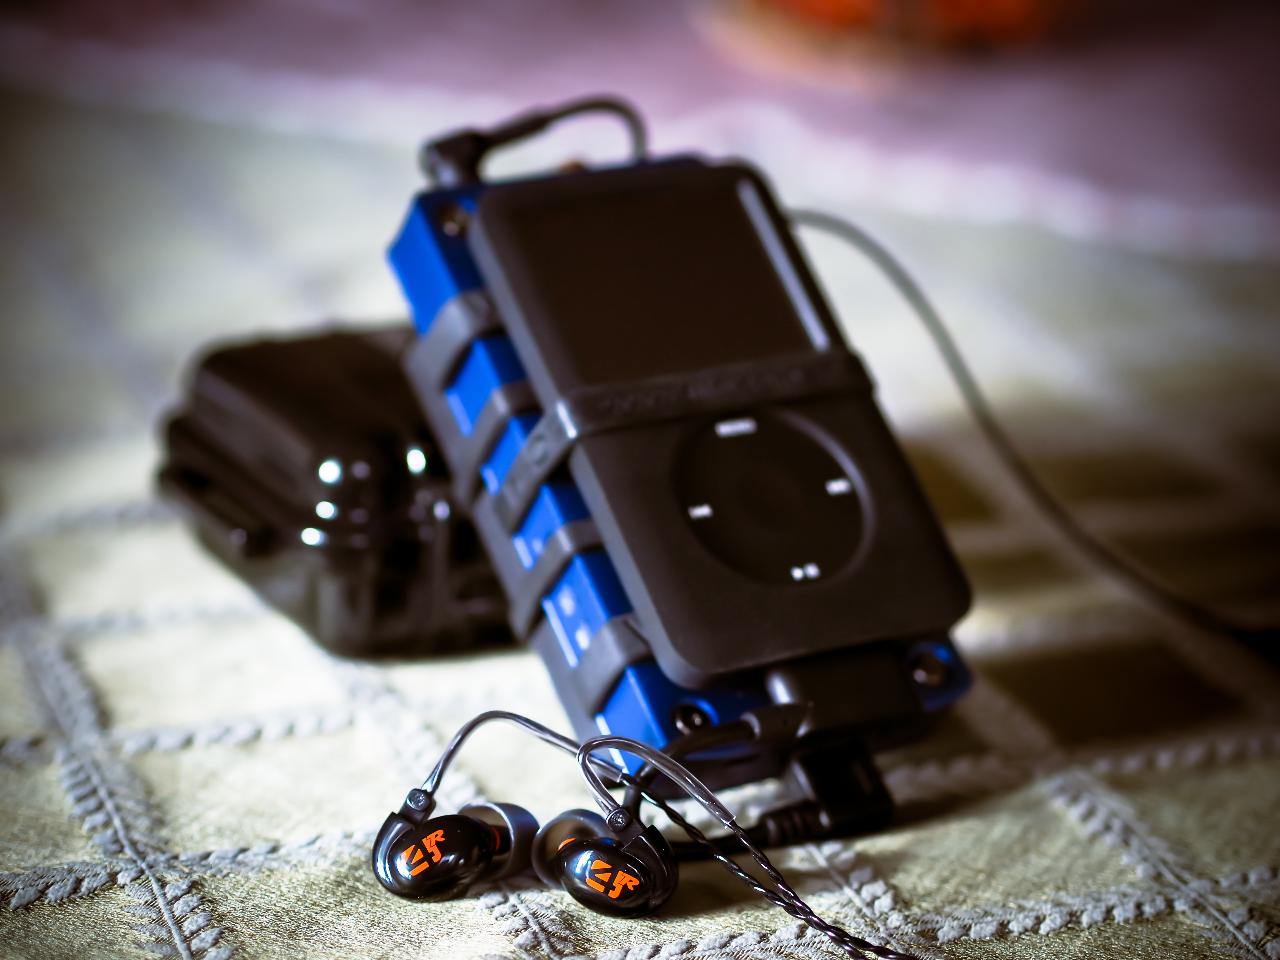 iPod Classic 160GB → VentureCraft GoDAP DD Socket 1 (MUSES01) → JDS Labs C421 → Westone 4R